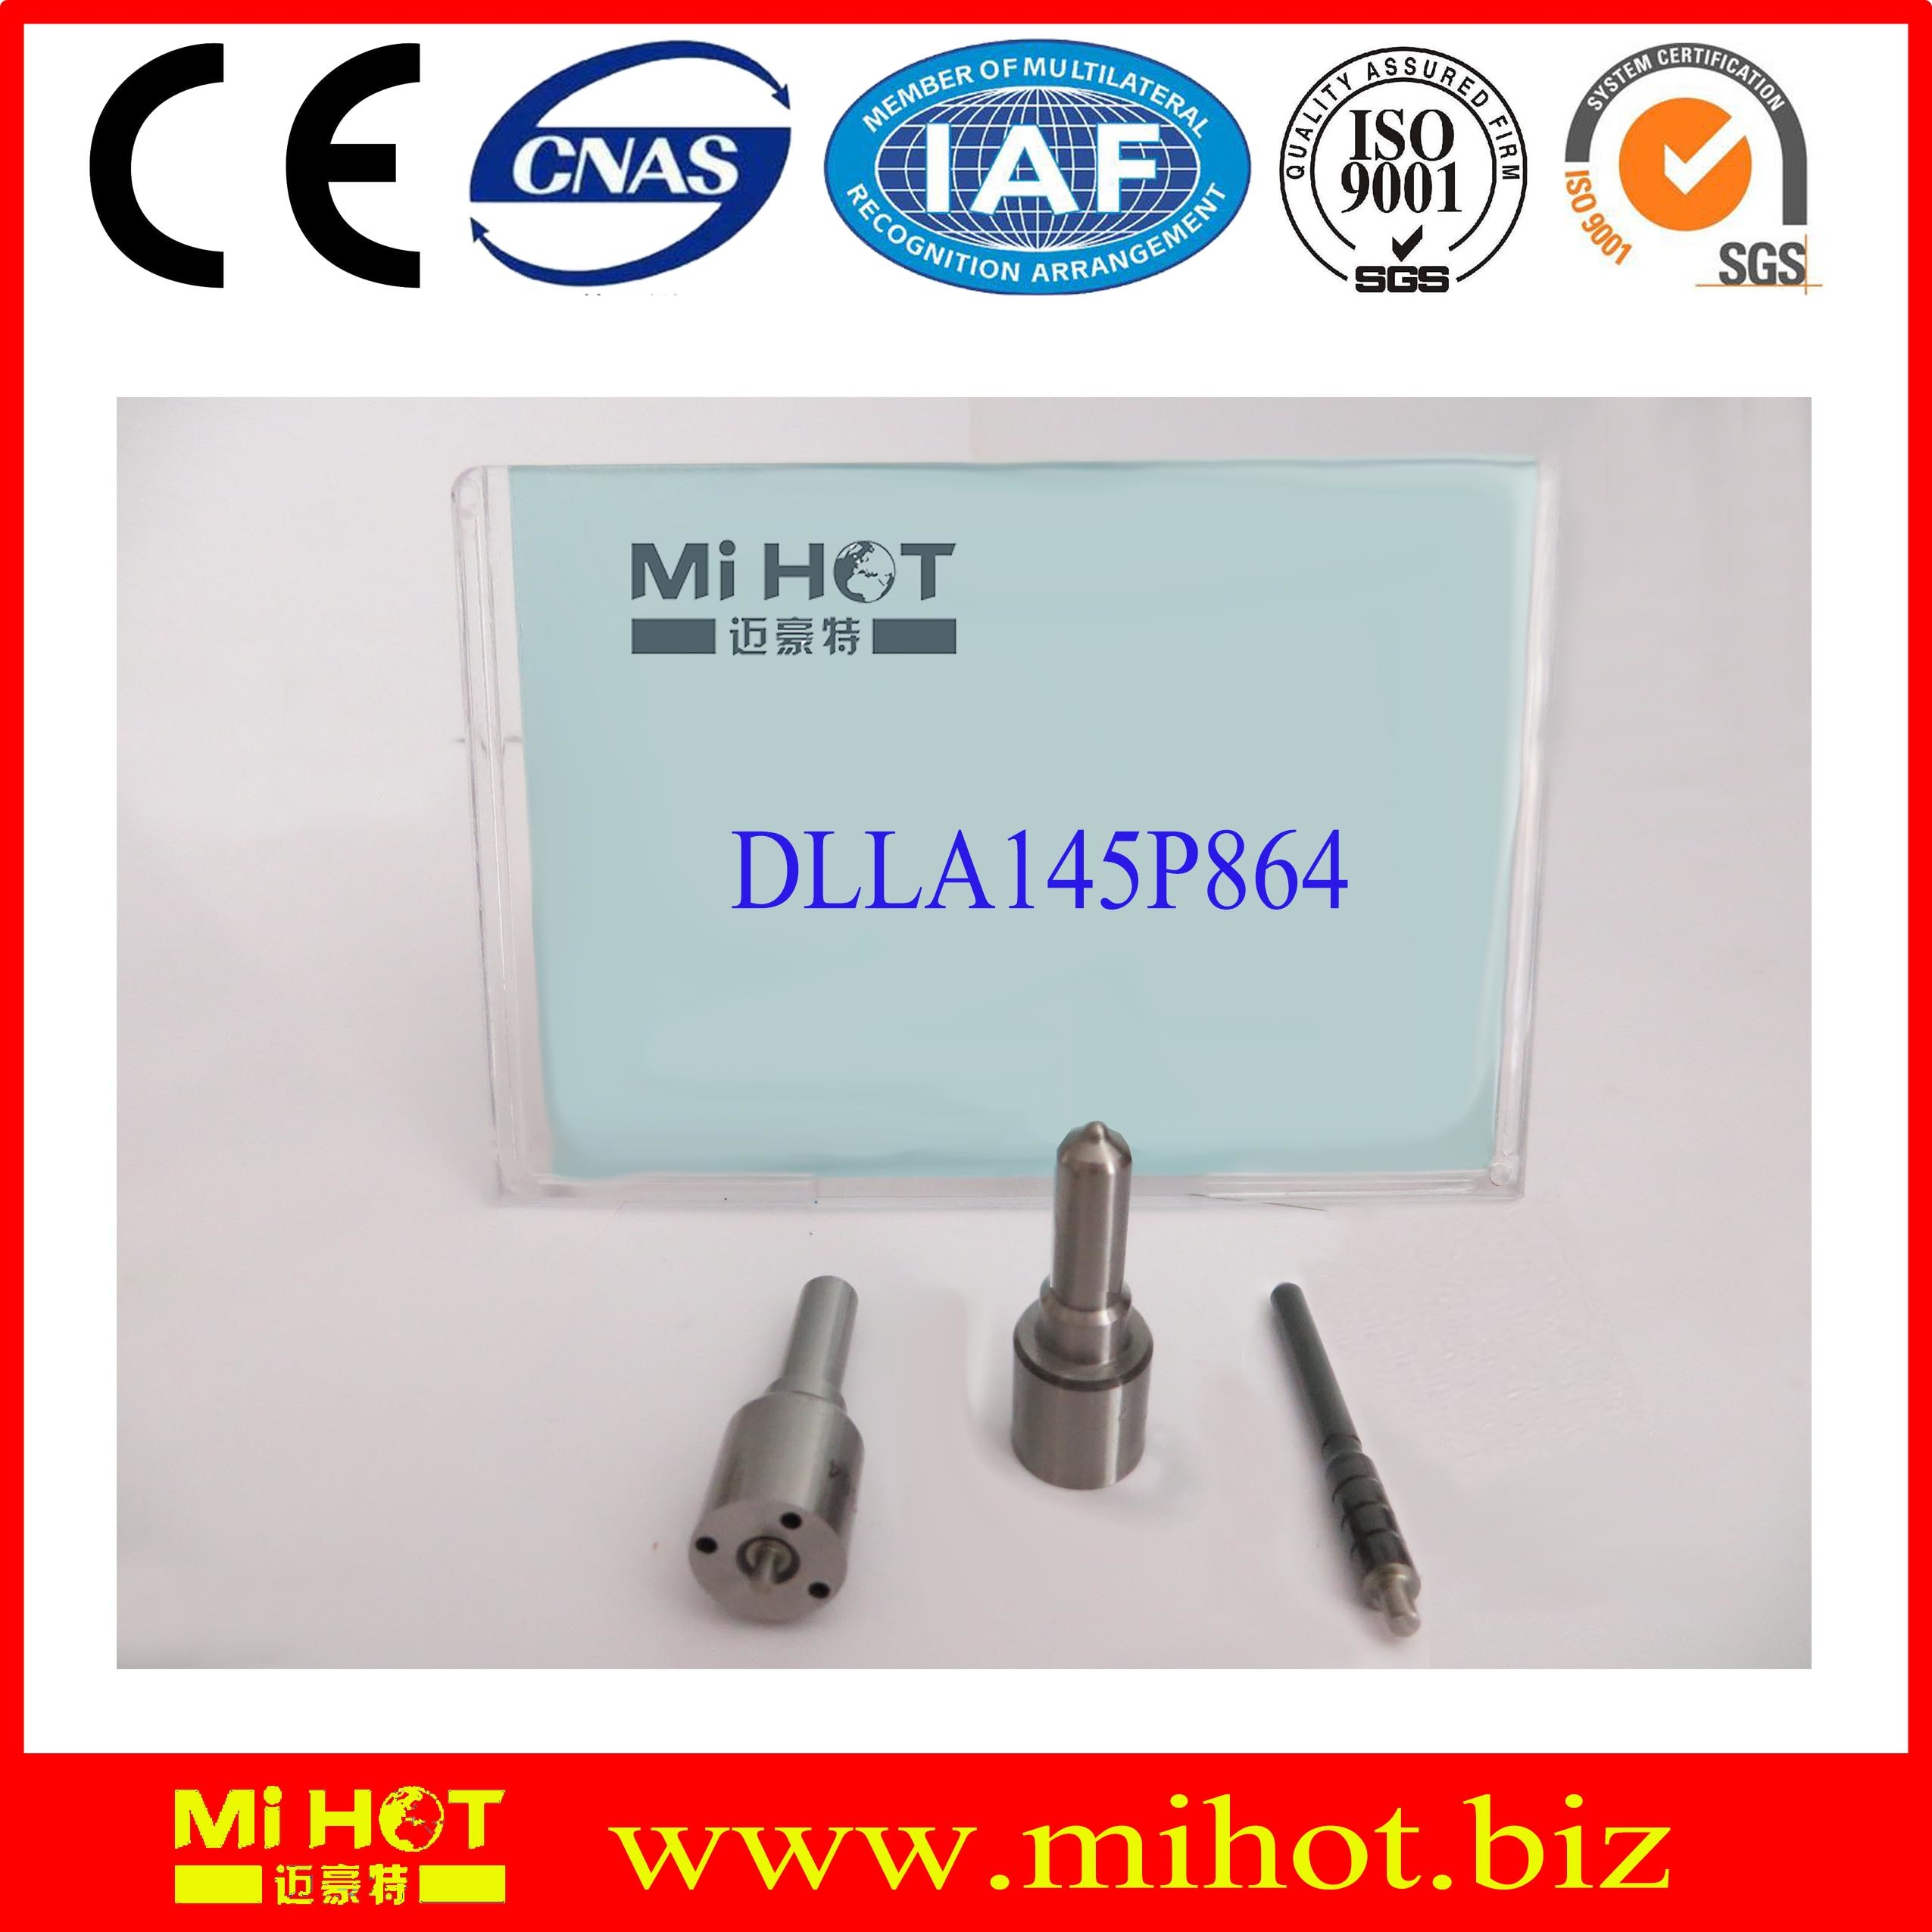 Common Rail Diesel Injector Nozzle Dlla145p864